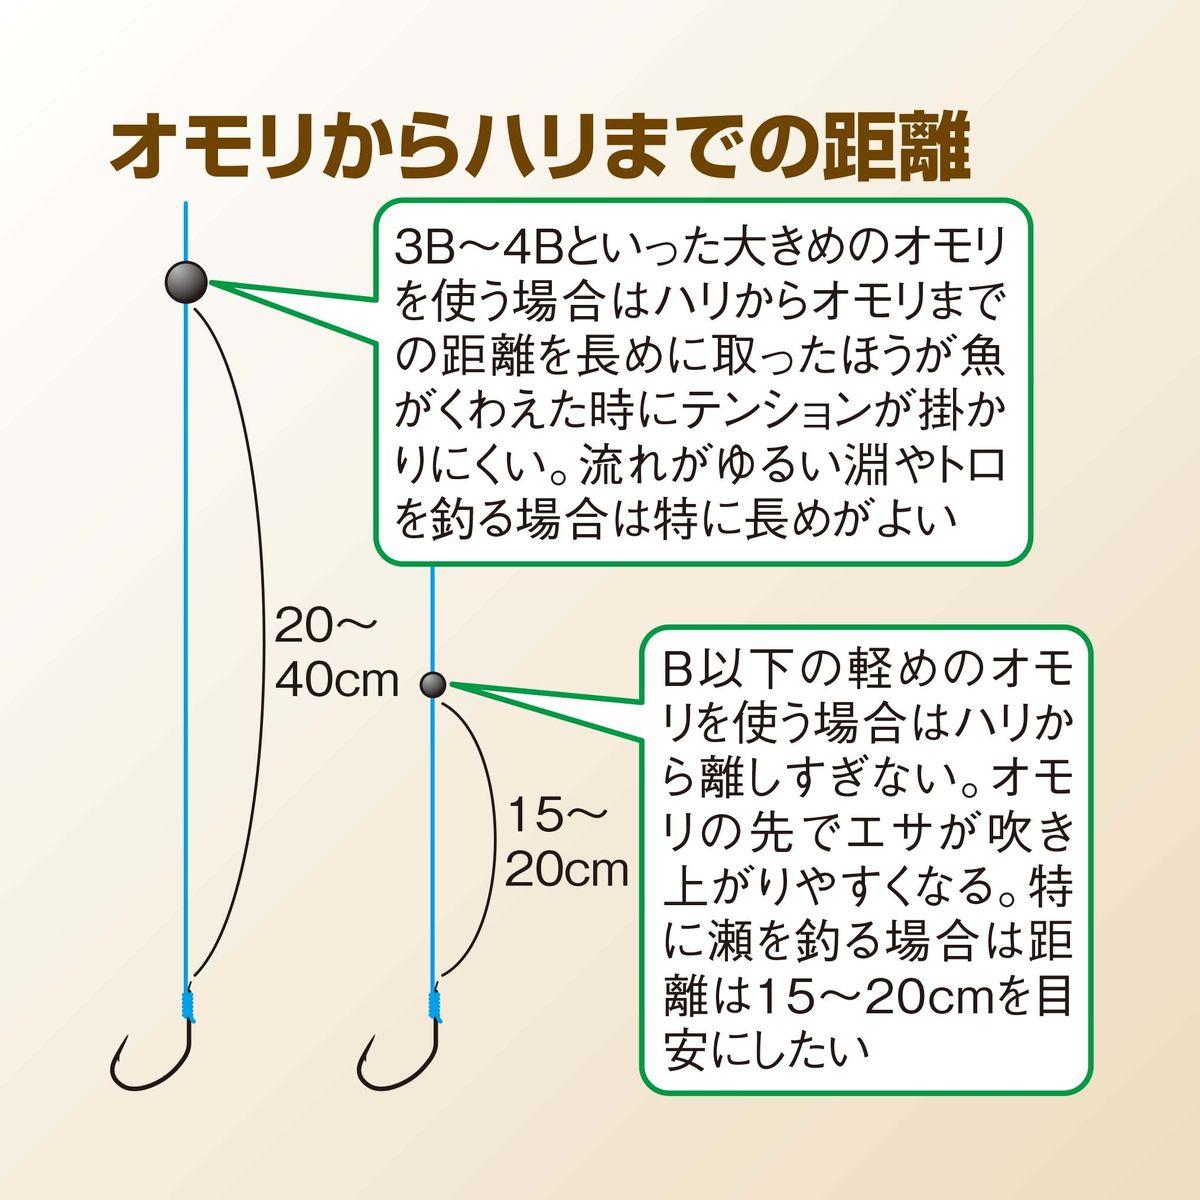 050-055keiryu-nyumon_cs6 (3)